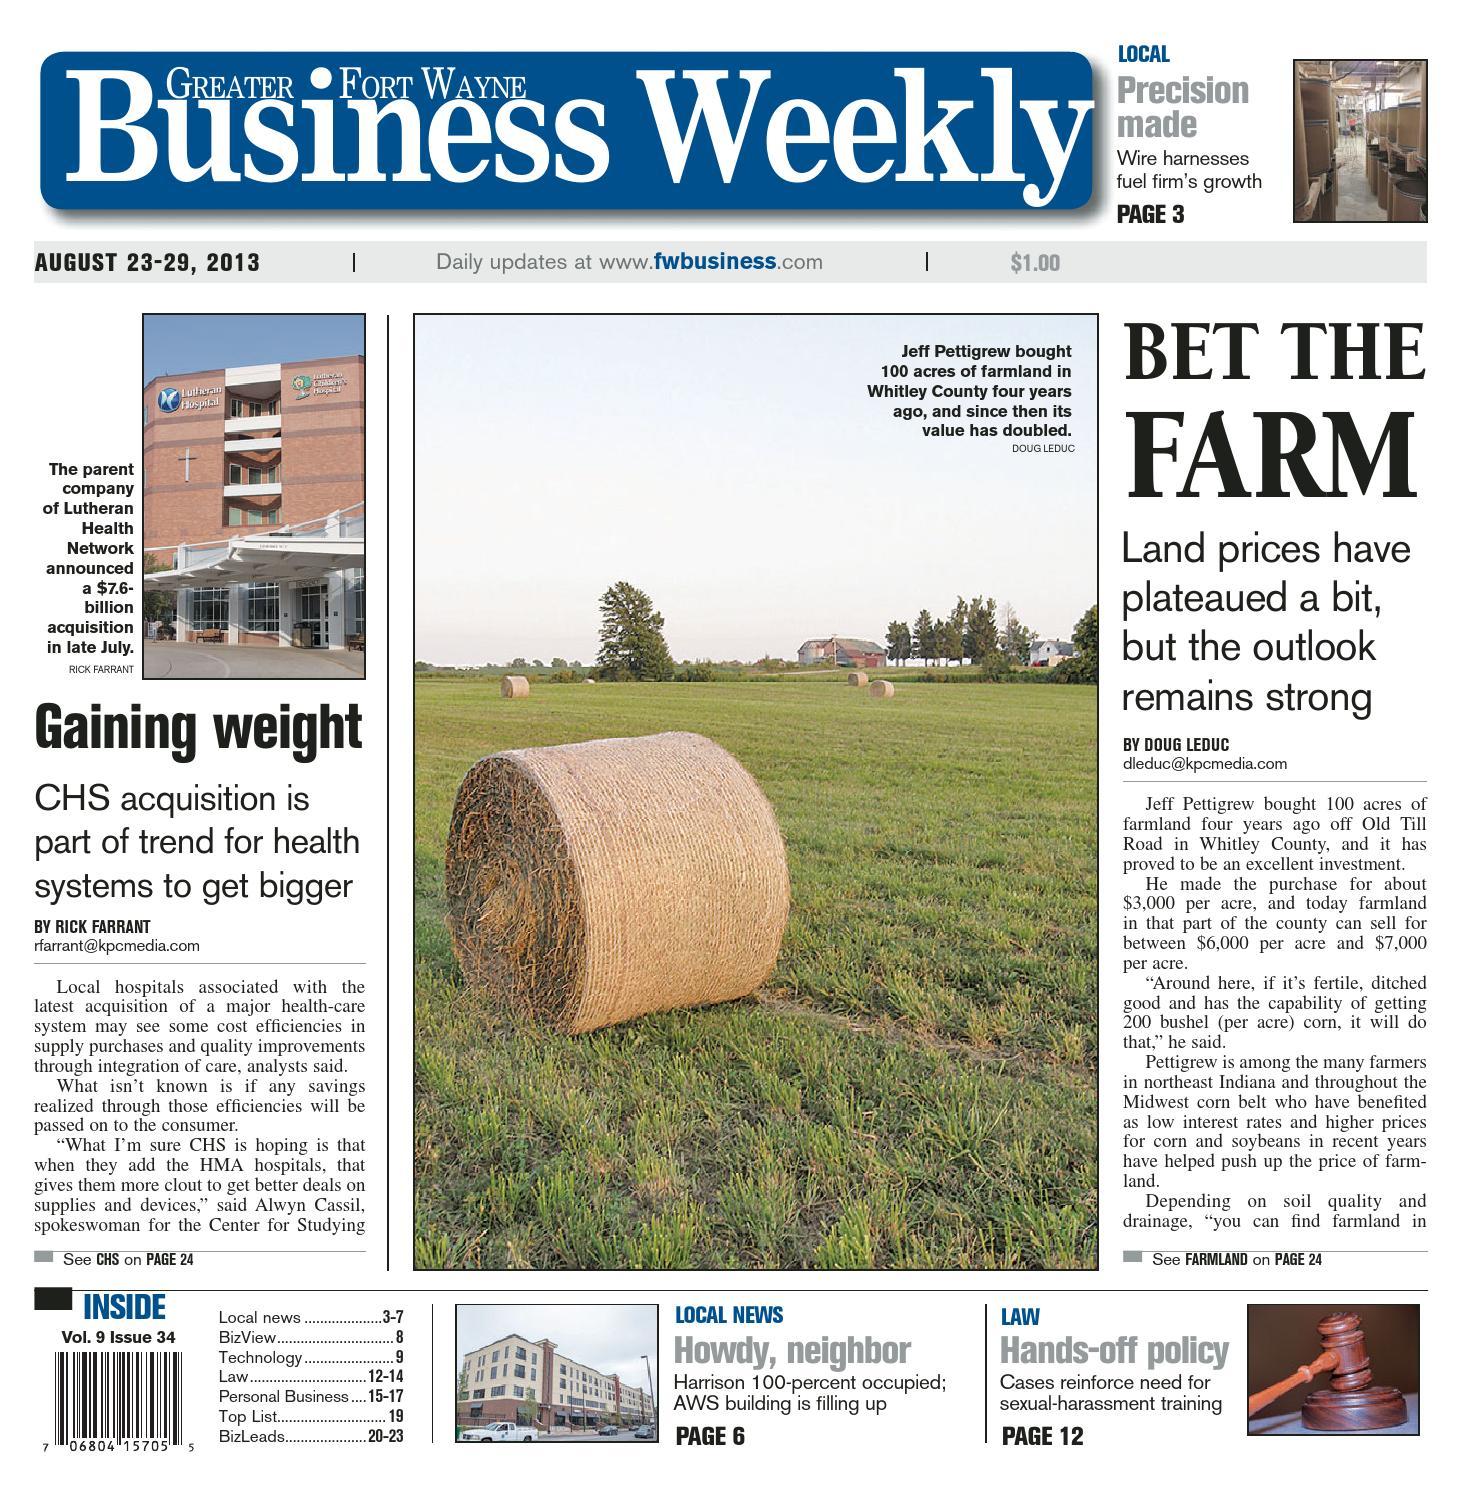 Greater Fort Wayne Business Weekly Jan 10 2014 by KPC Media